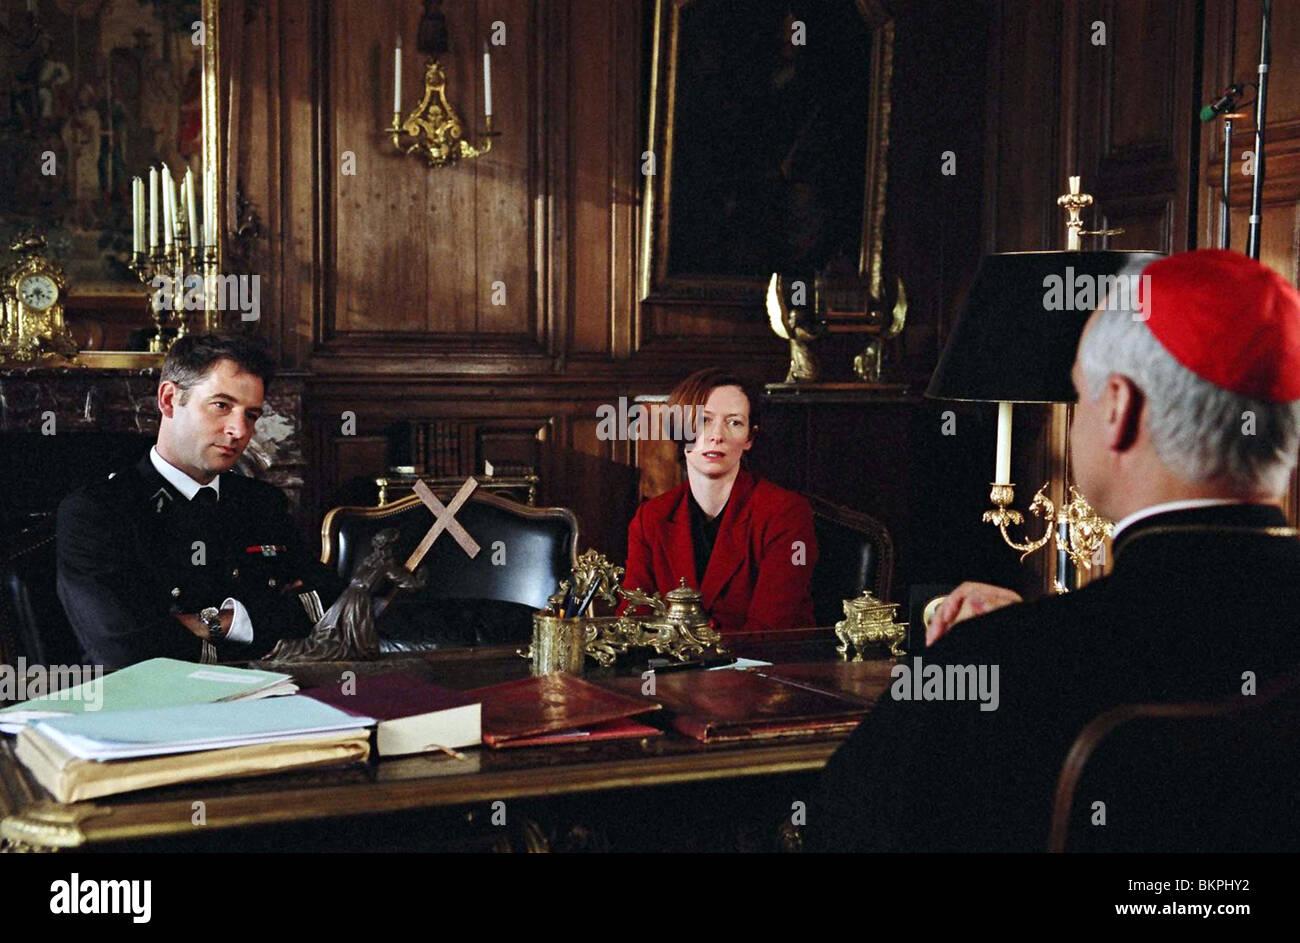 THE STATEMENT (2003) CRIMES CONTRE L'HUMANITE (ALT) TILDA SWINTON, JEREMY NORTHAM NORMAN JEWISON (DIR) CCIL - Stock Image